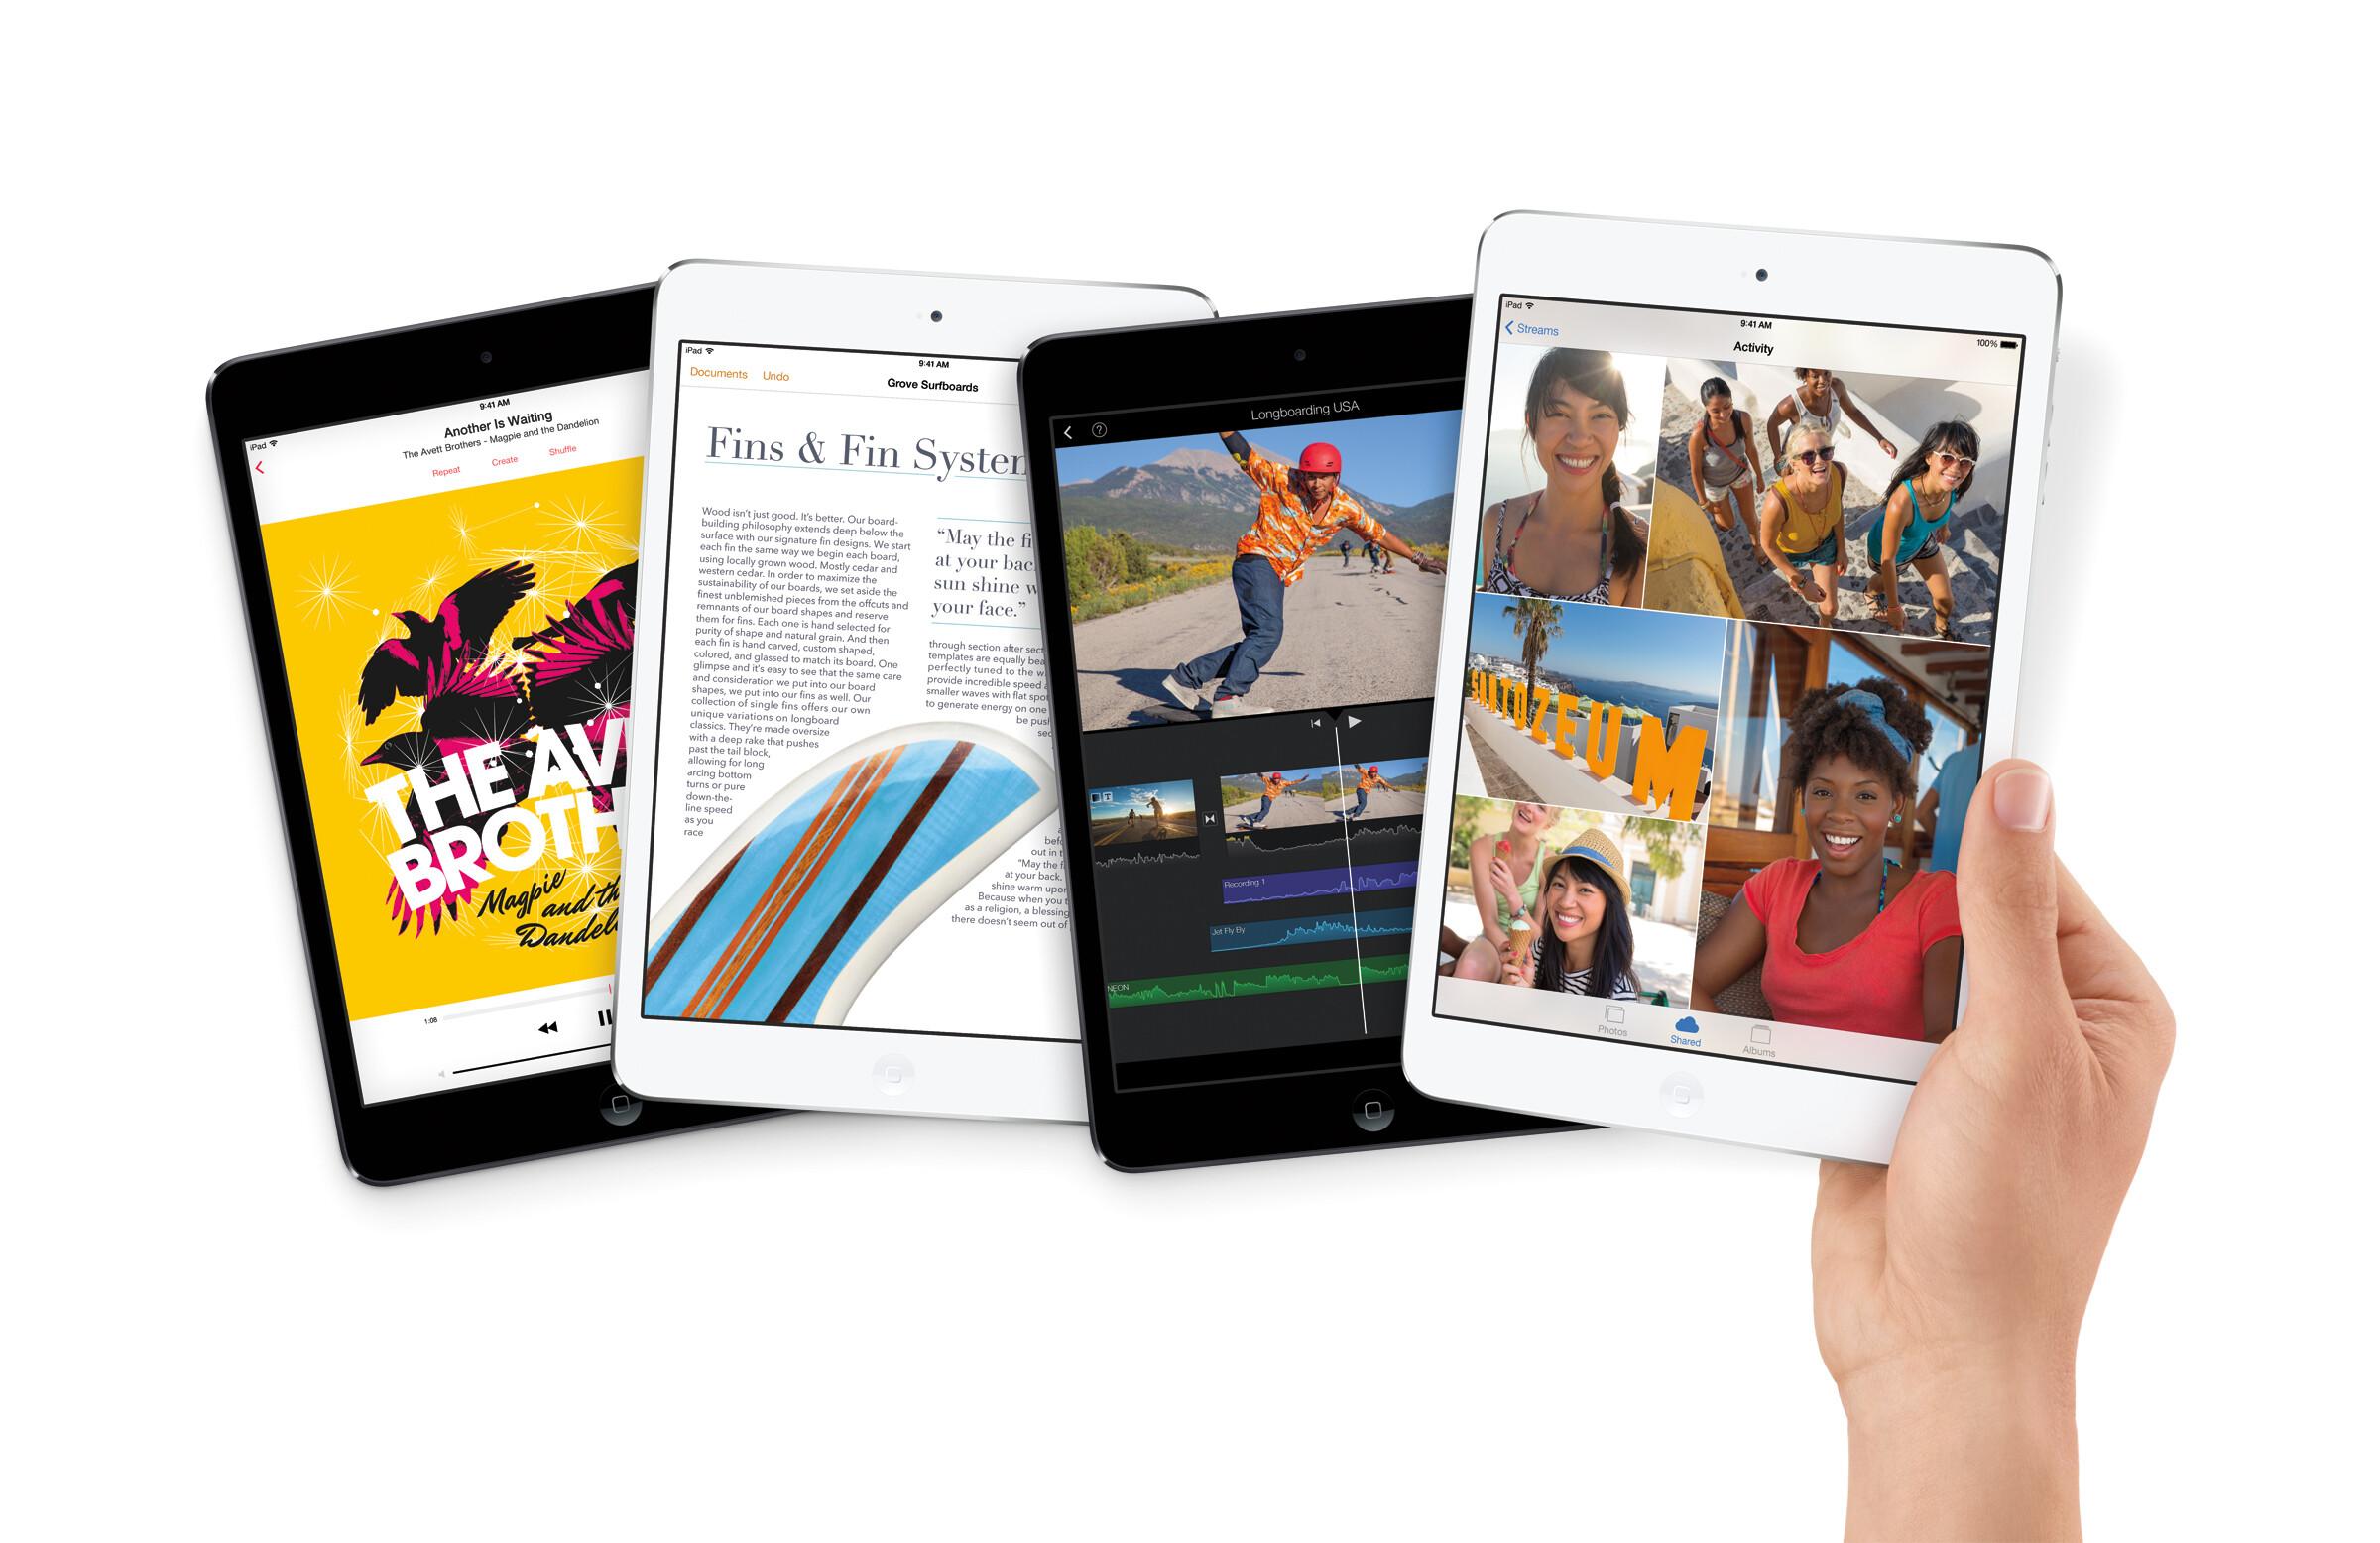 Ipad Retina: Apple IPad Mini 2 Specs